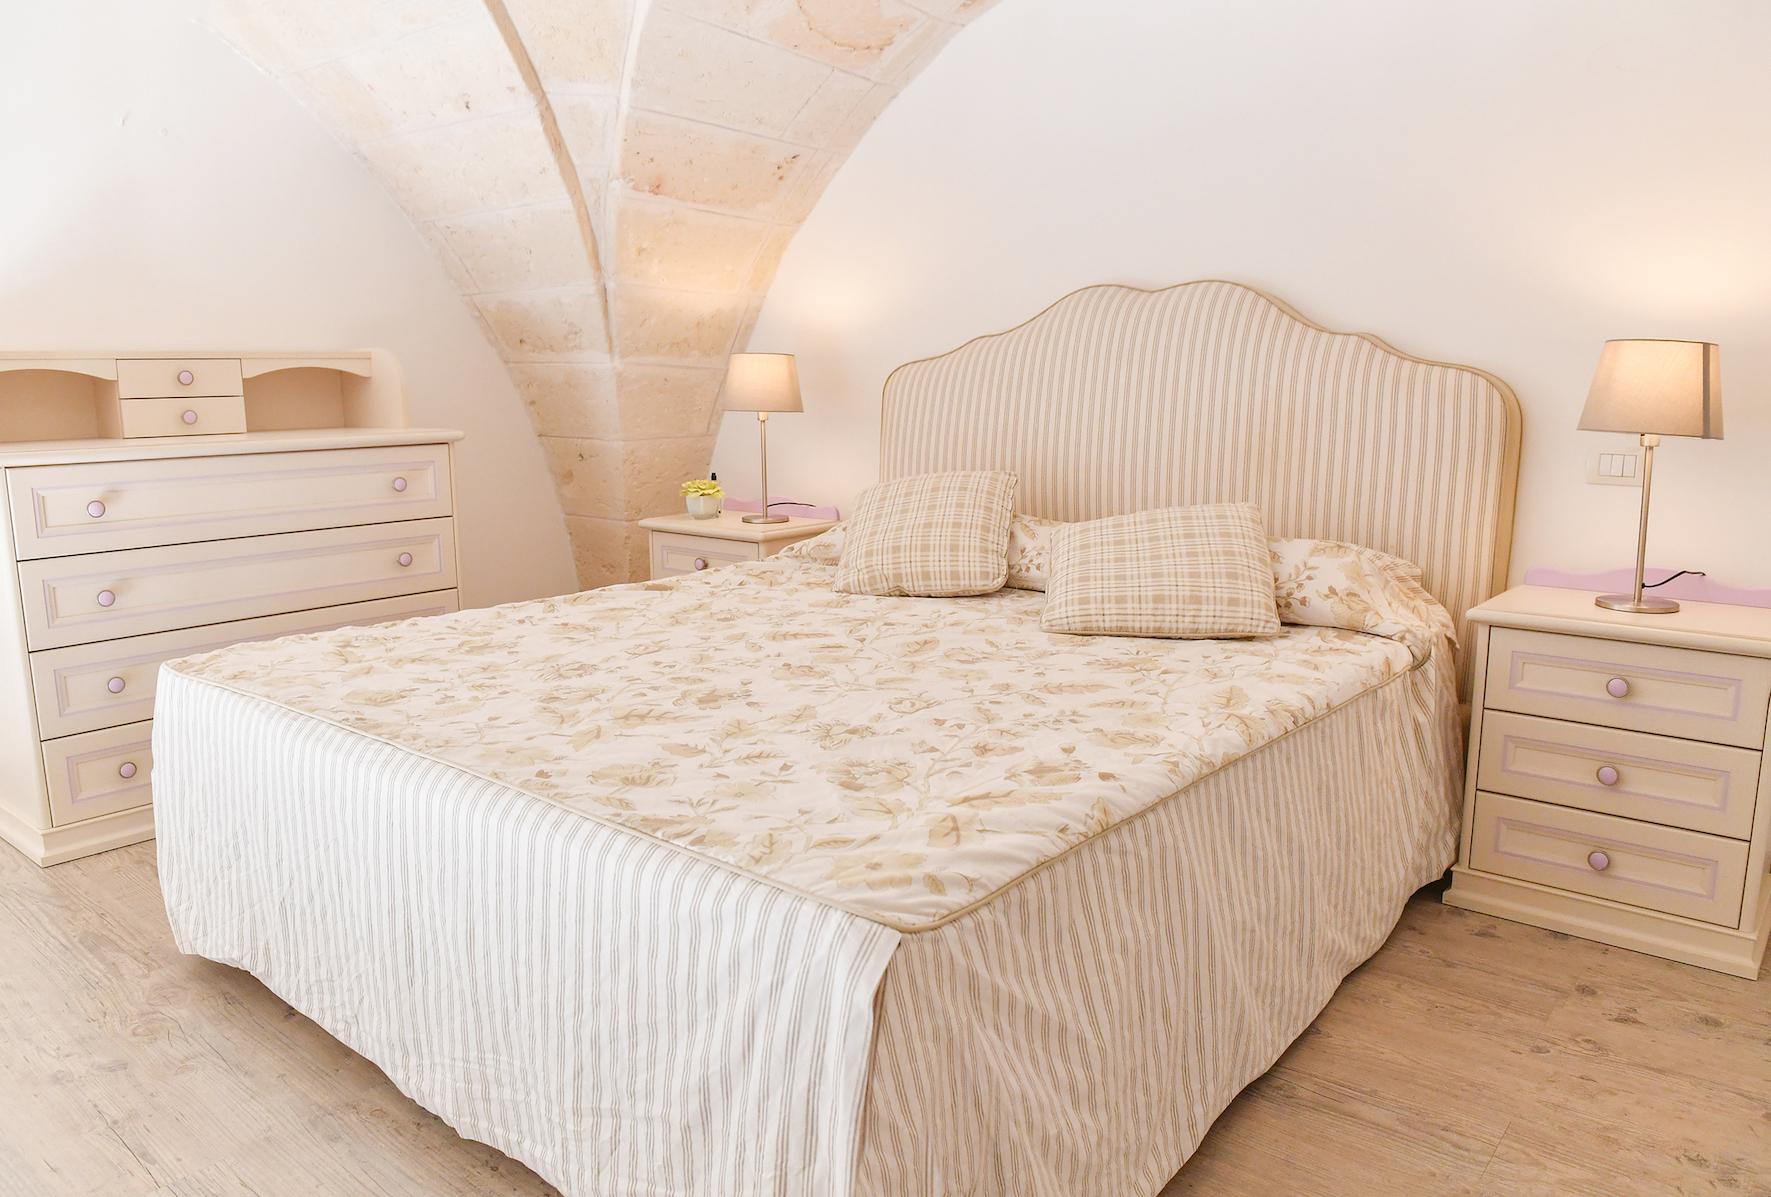 Lecce 5 - kamer op de tussenverdieping